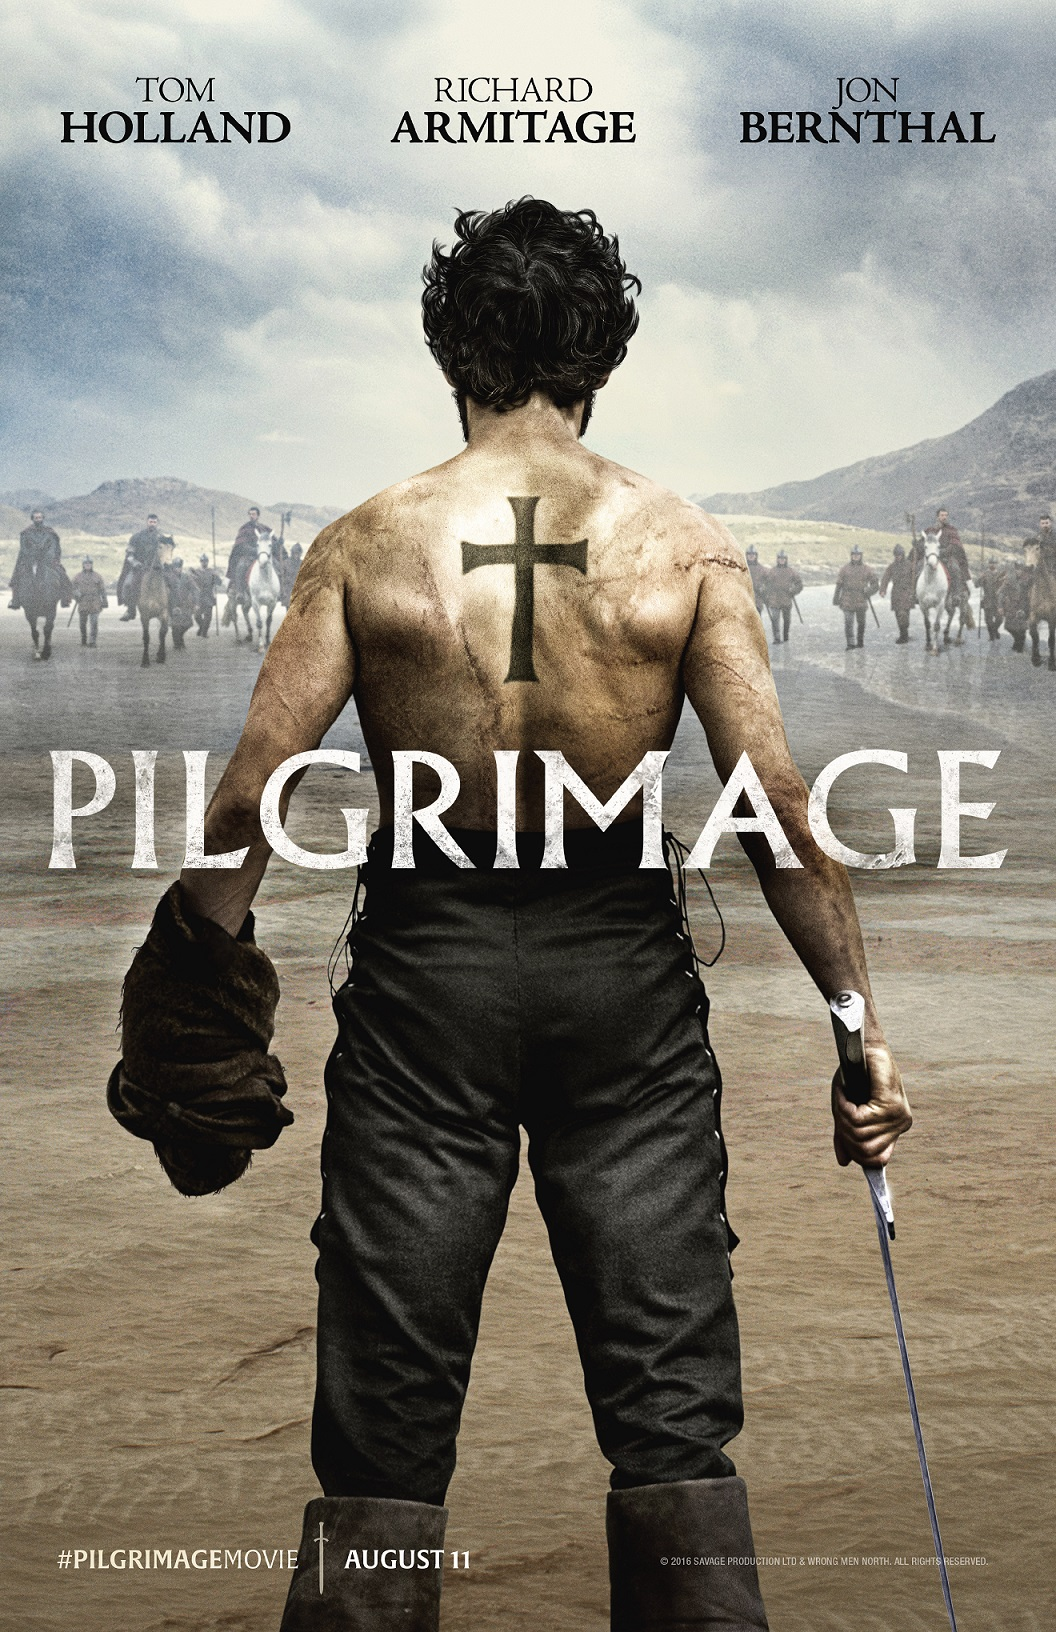 Pilgrimage Trailer & Poster